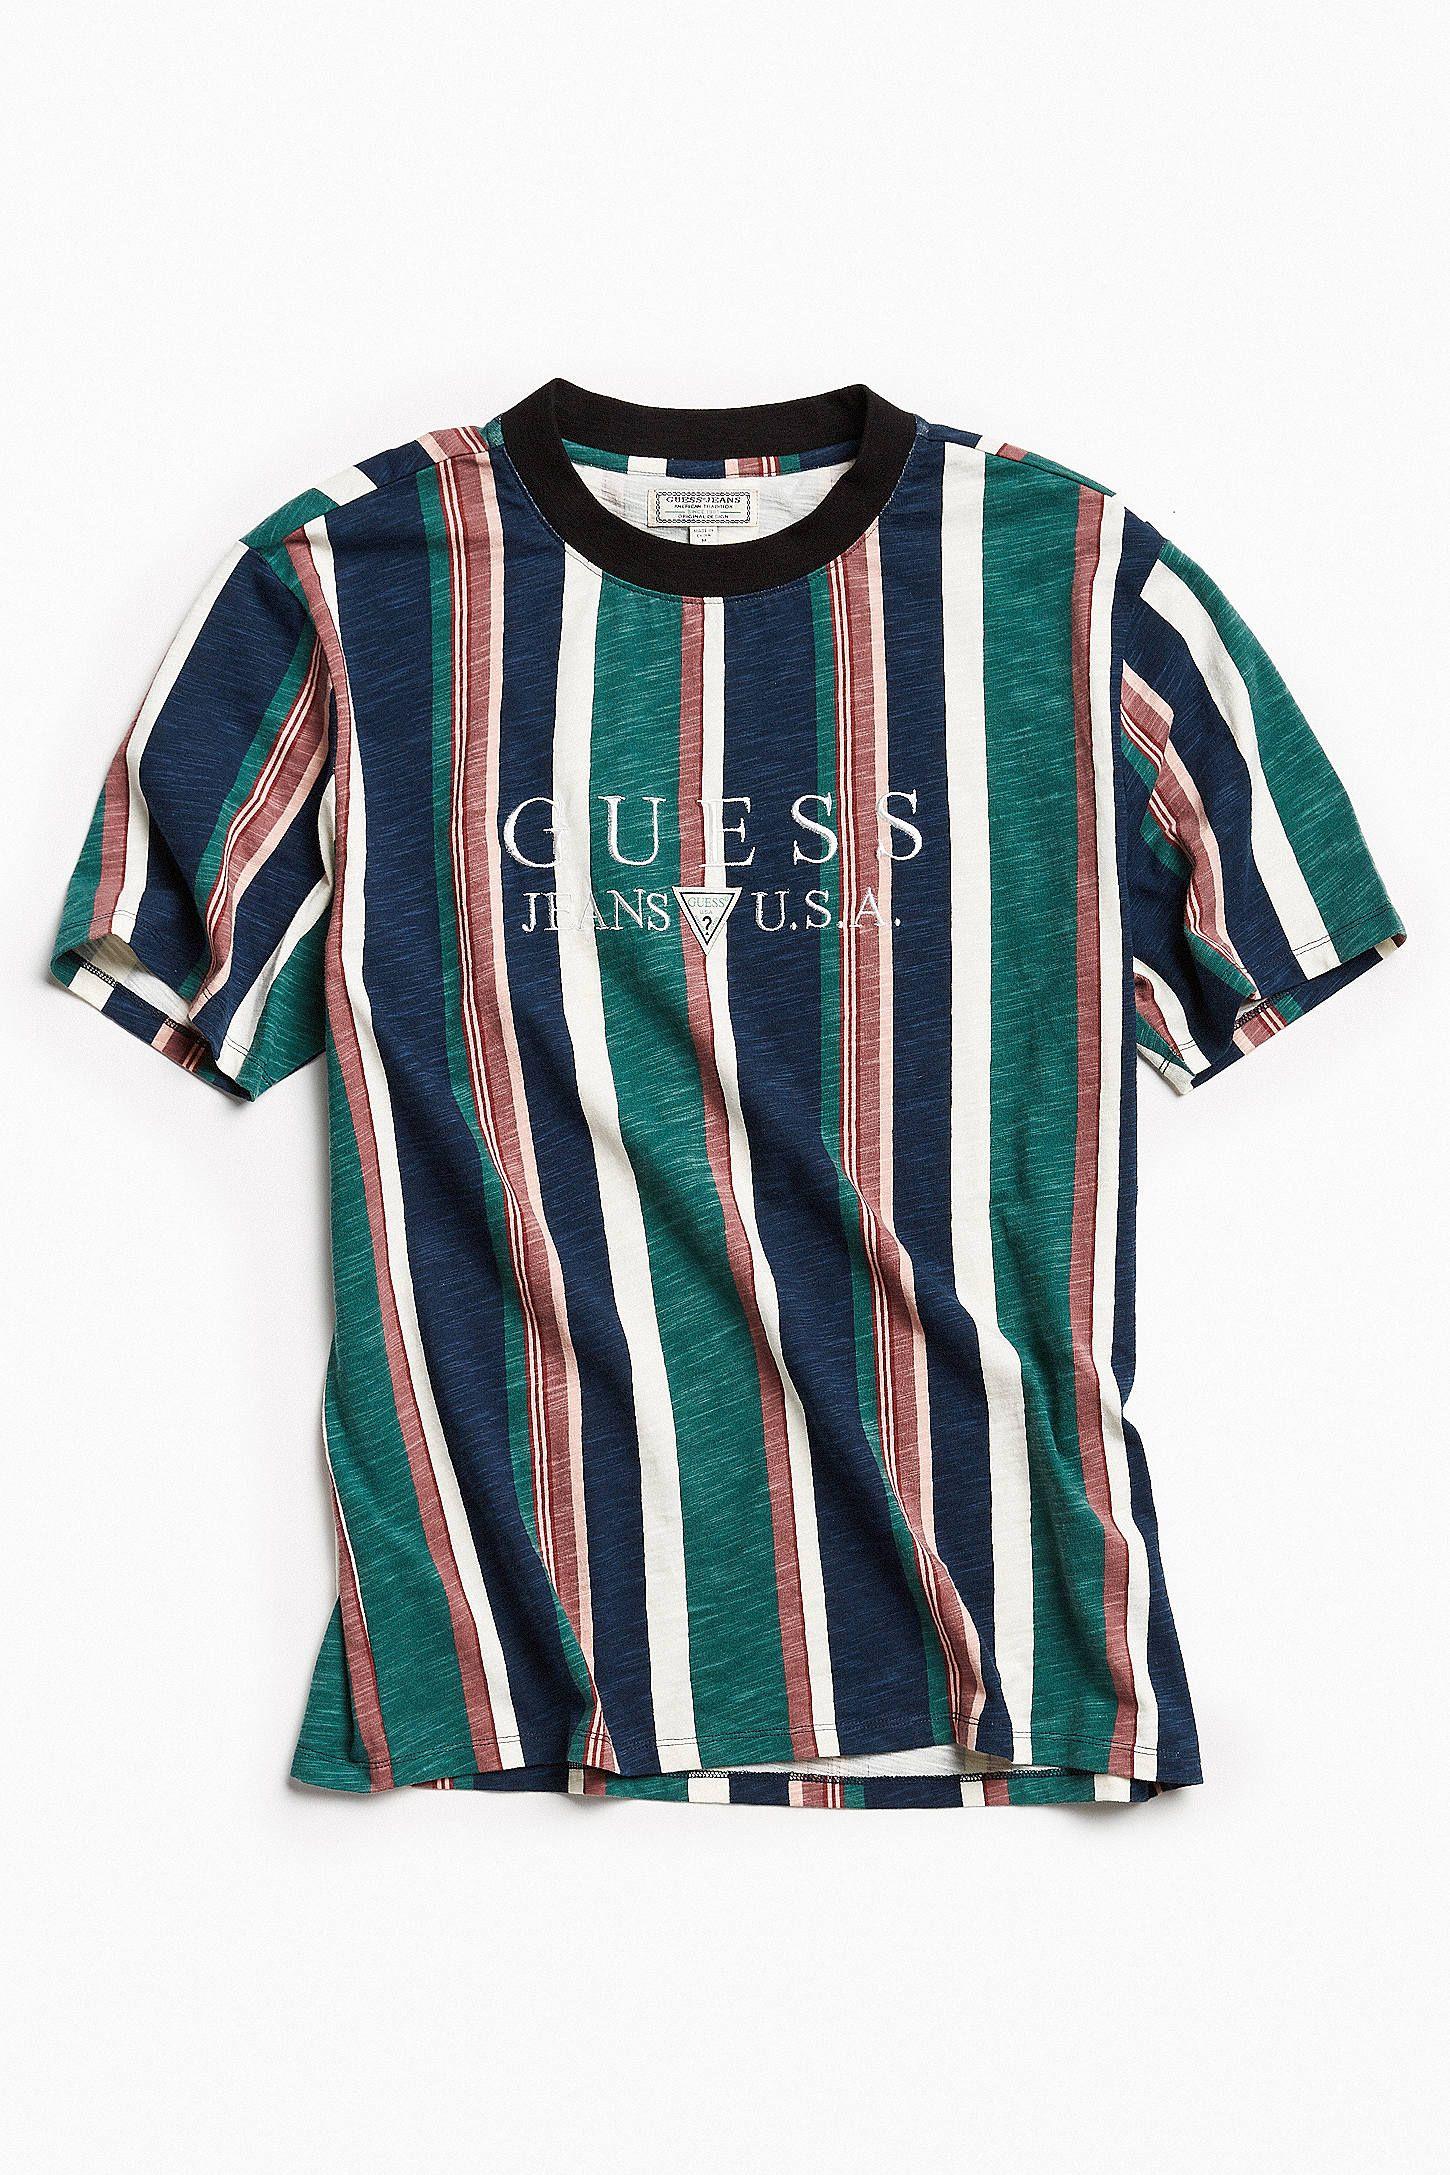 5f9acab5d389 Guess Jeans Usa 1981 Capsule Striped T Shirt Asap Vertical – DACC